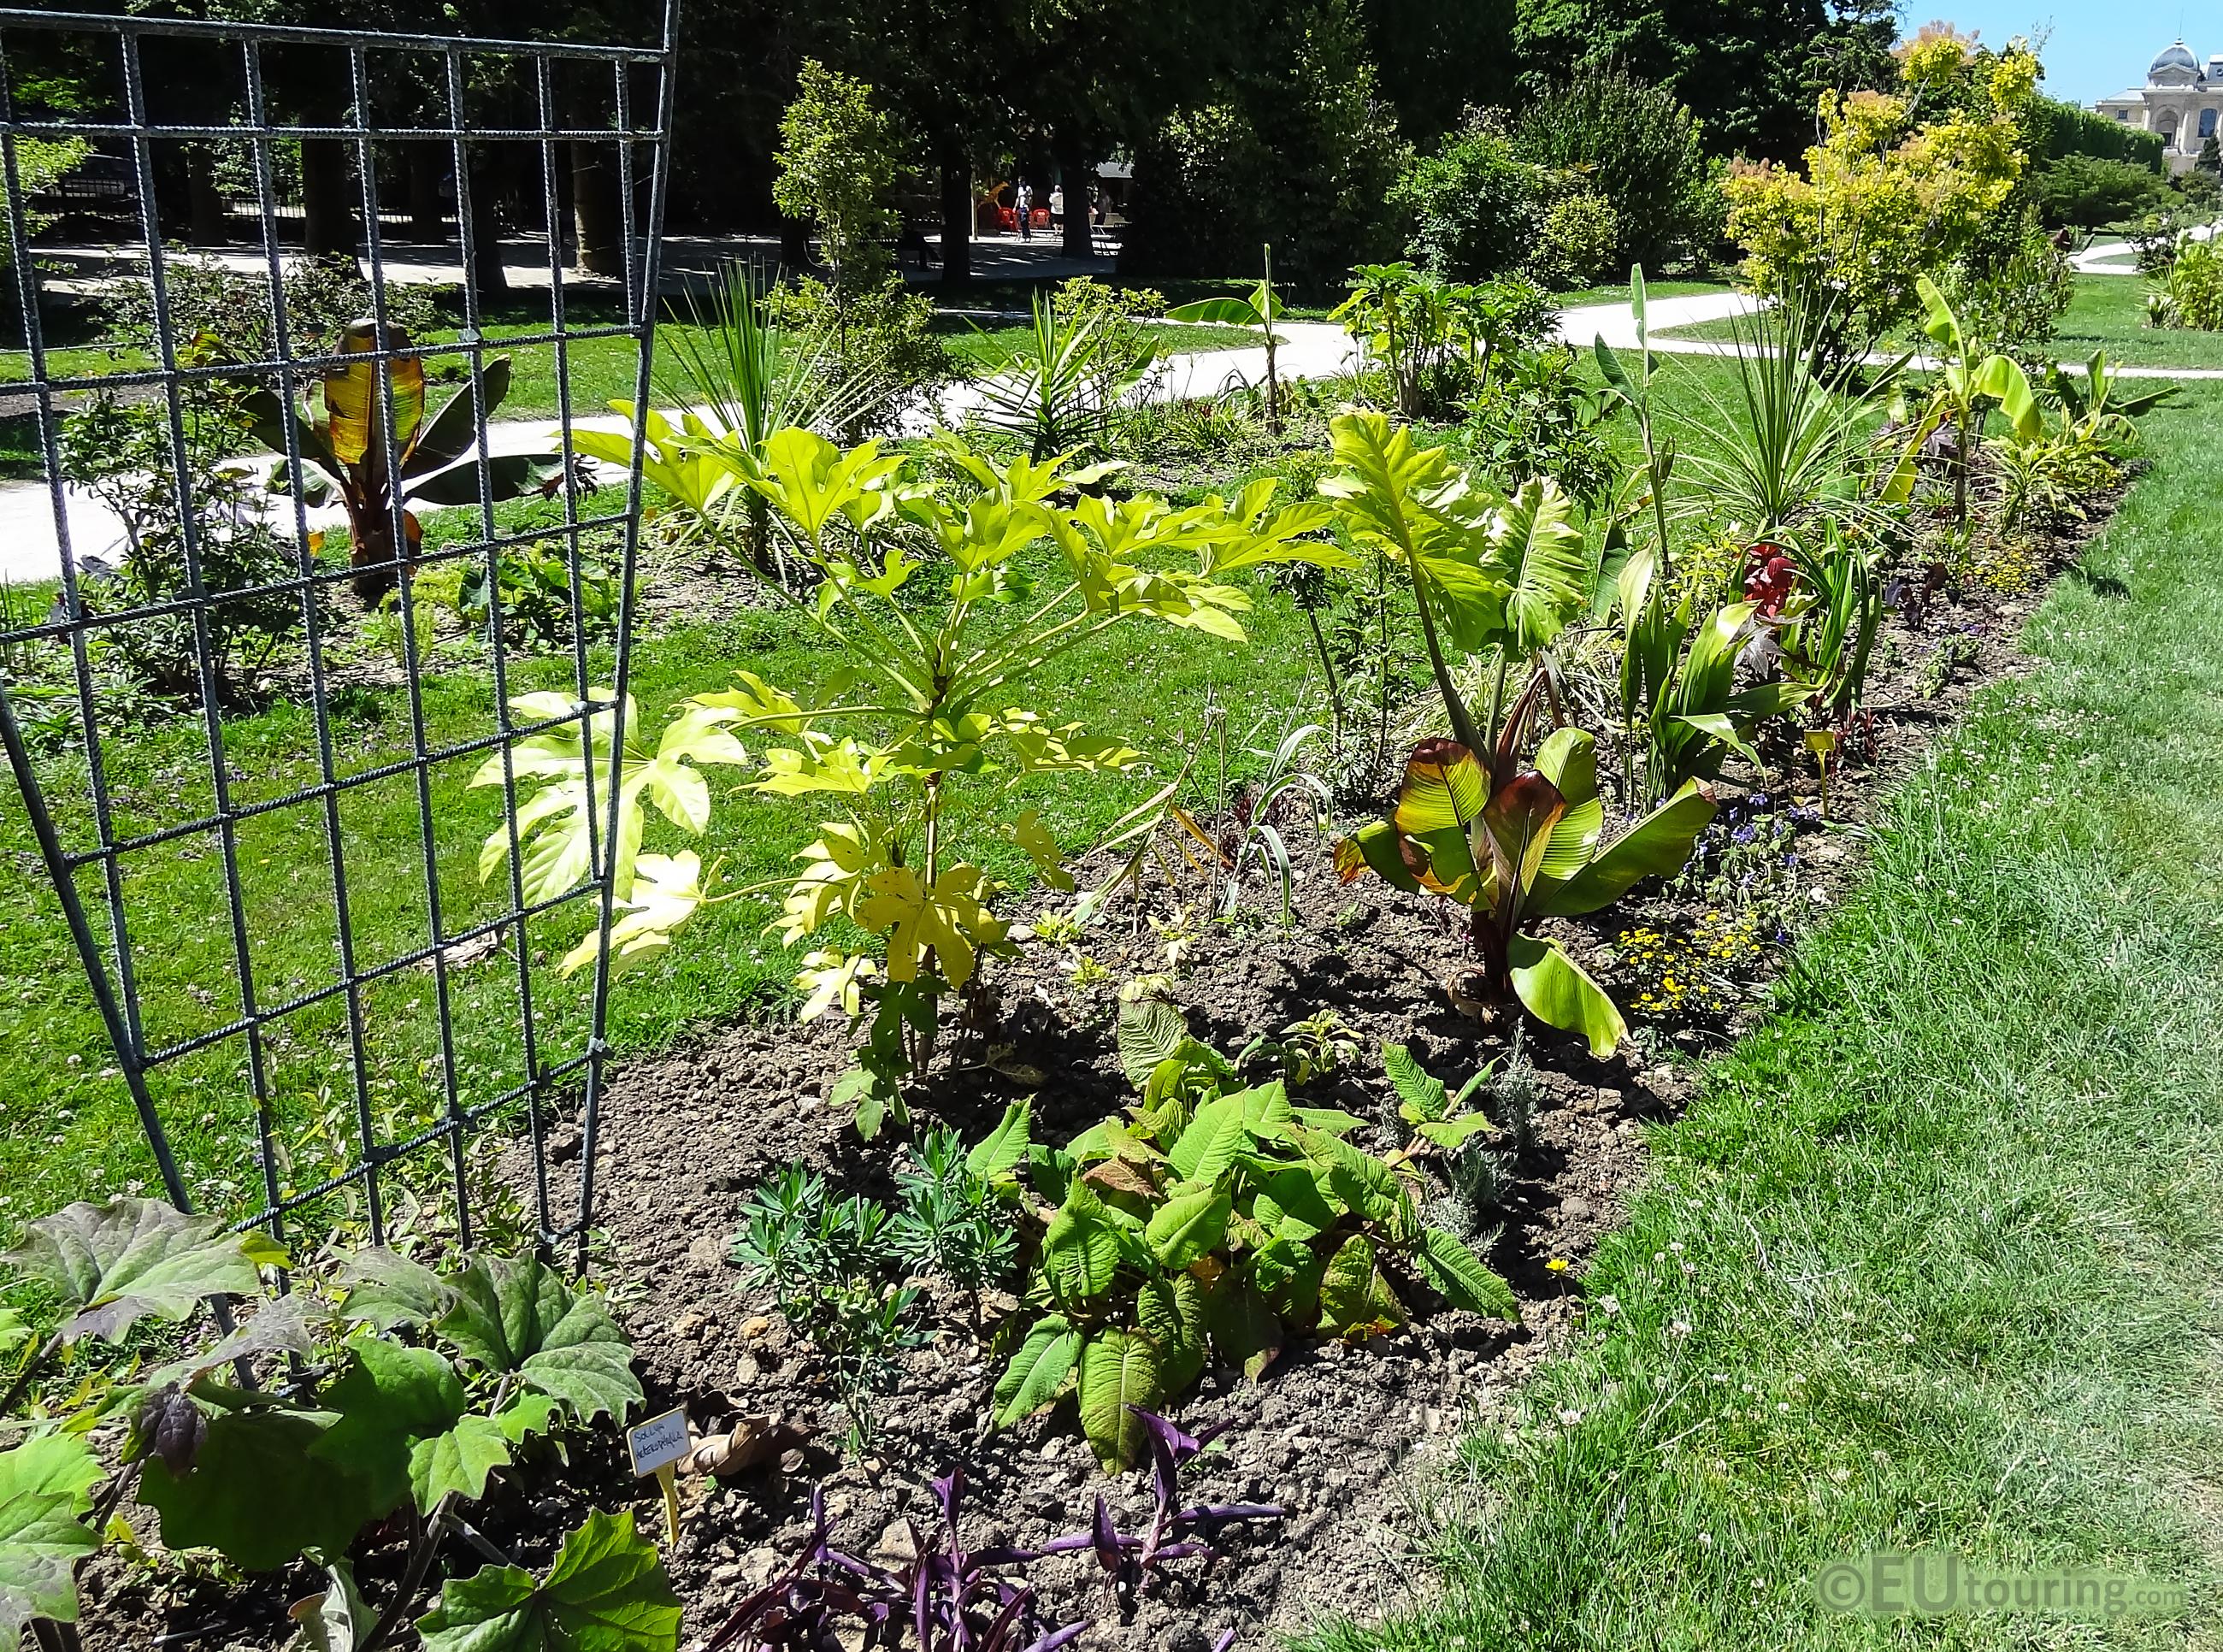 Jardin des Plantes greenery